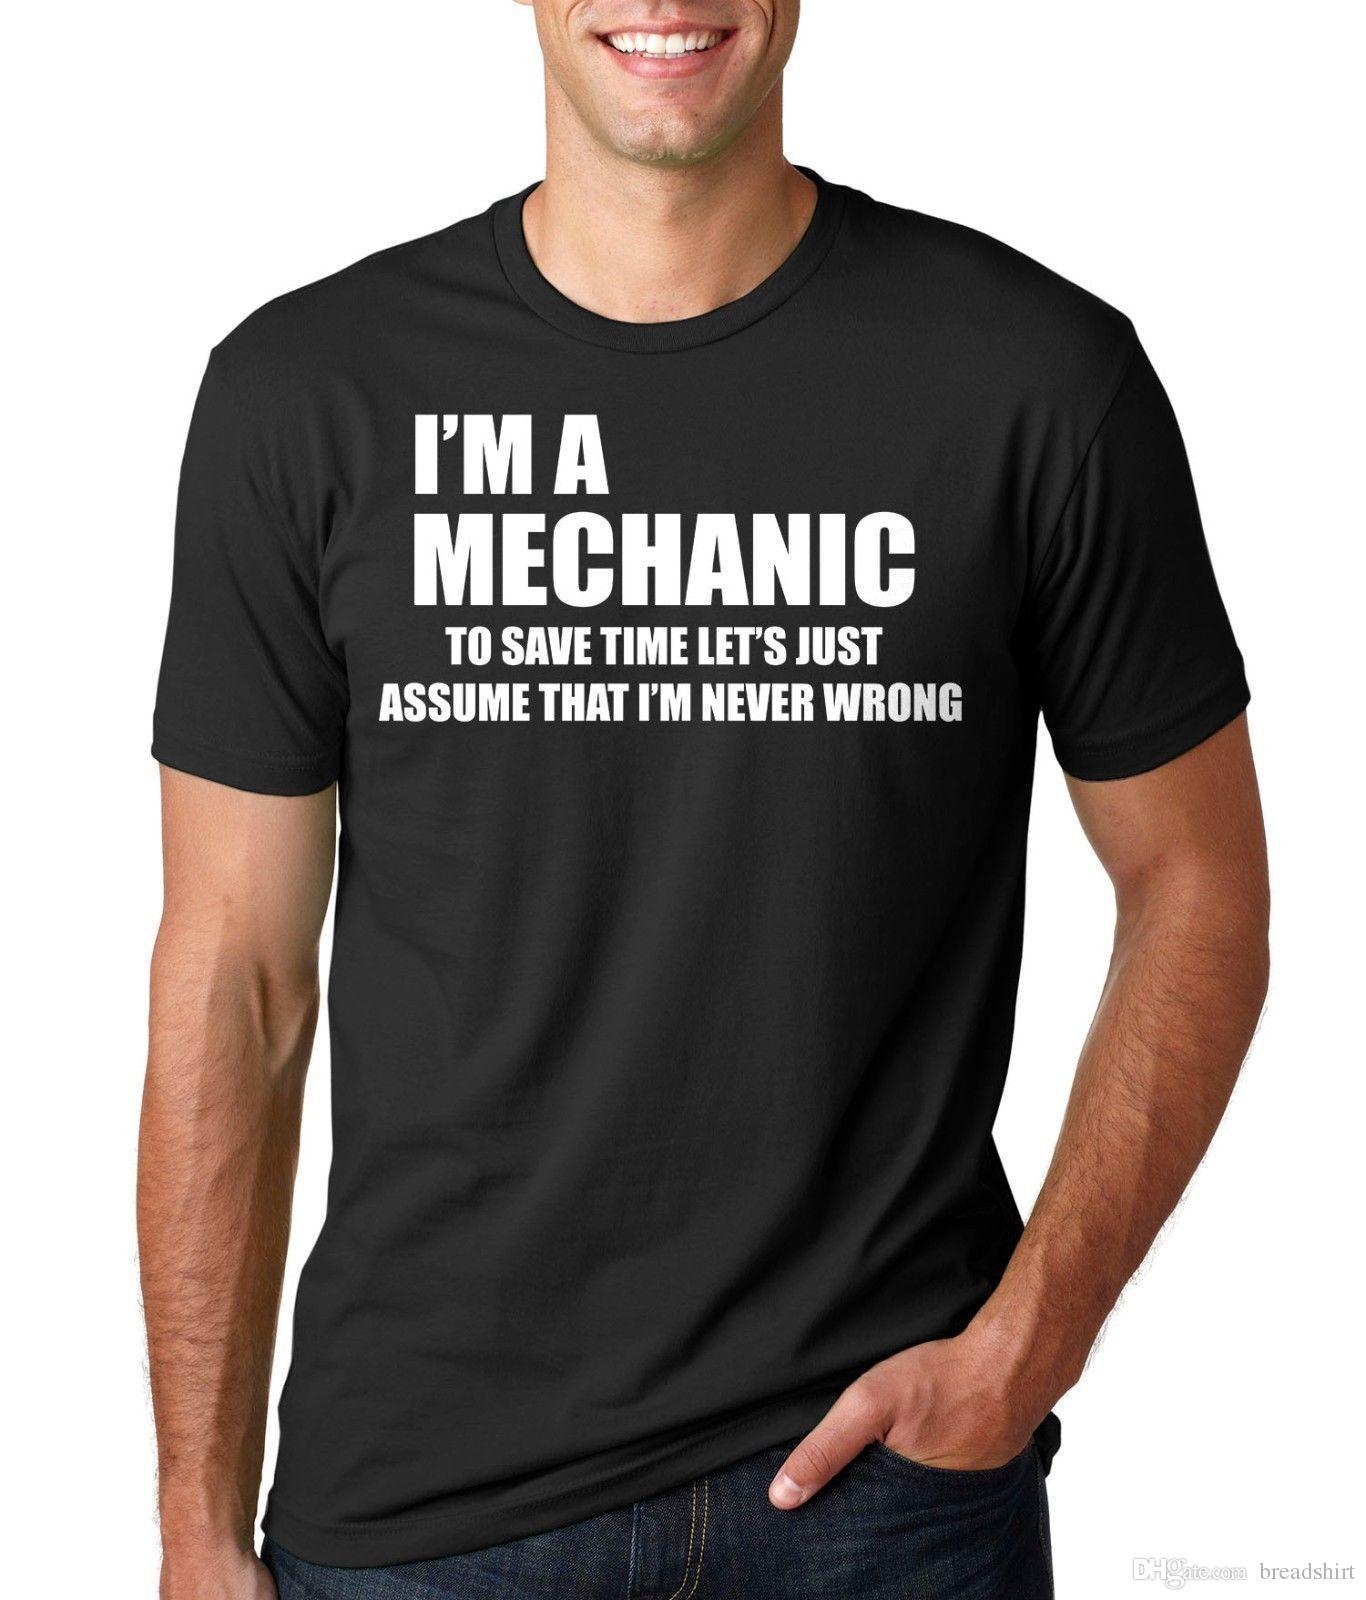 93ad20f39 Mechanic T Shirt Gift For Mechanic Funny Mechanic T Shirts Gift T Shirt  Quality T Shirts T Shirt Slogans From Breadshirt, $10.49| DHgate.Com